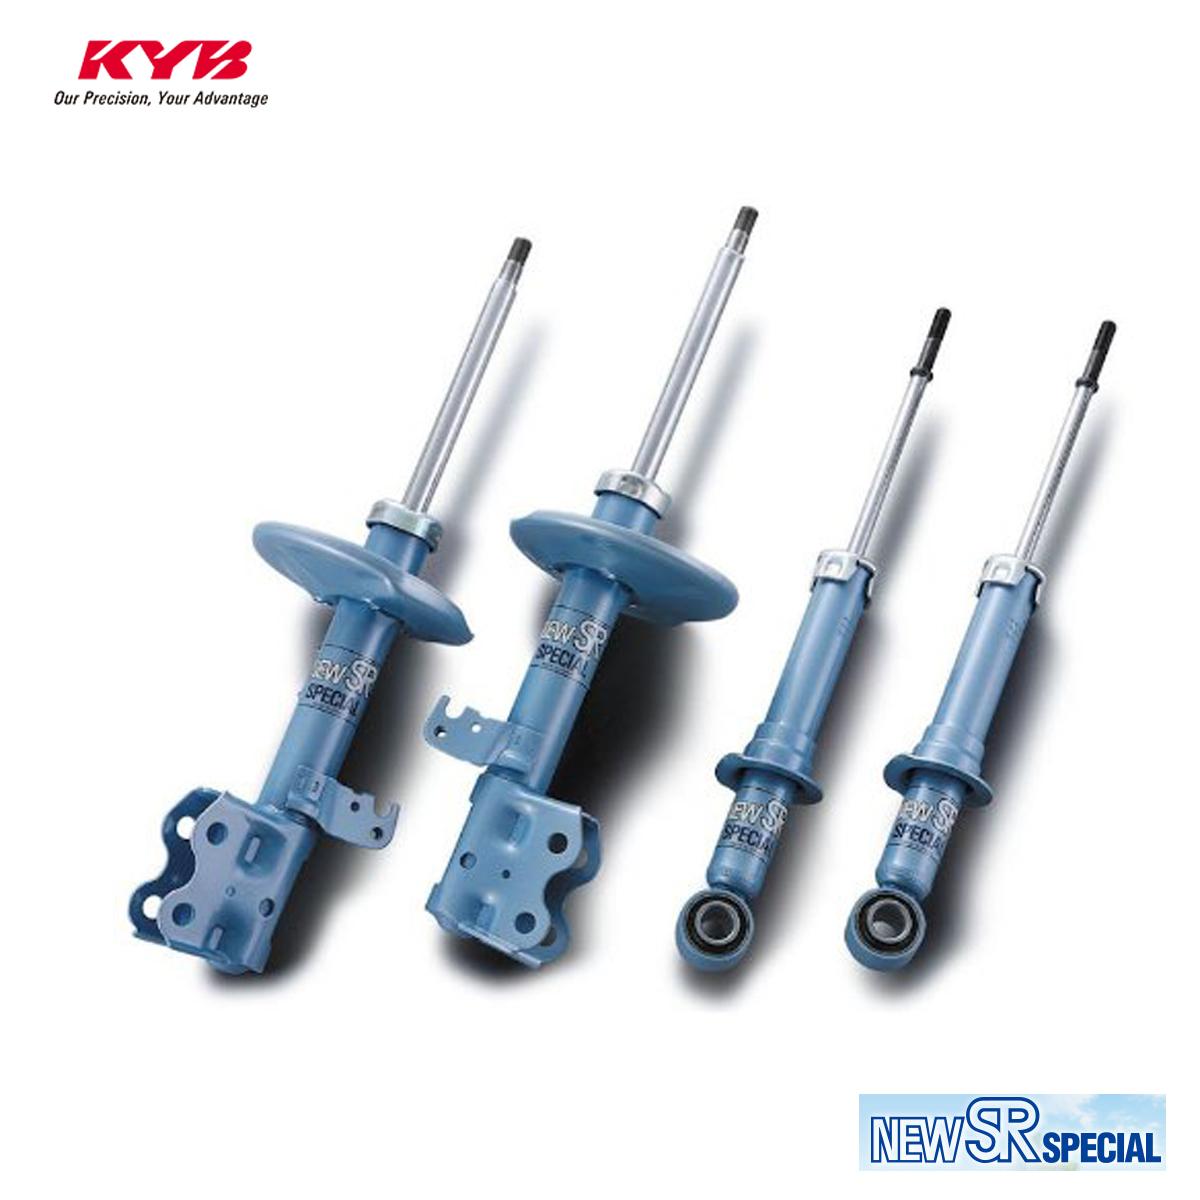 KYB カヤバ パオ PK10 ショックアブソーバー フロント 右用 1本 NEW SR SPECIAL NST5281R 配送先条件有り